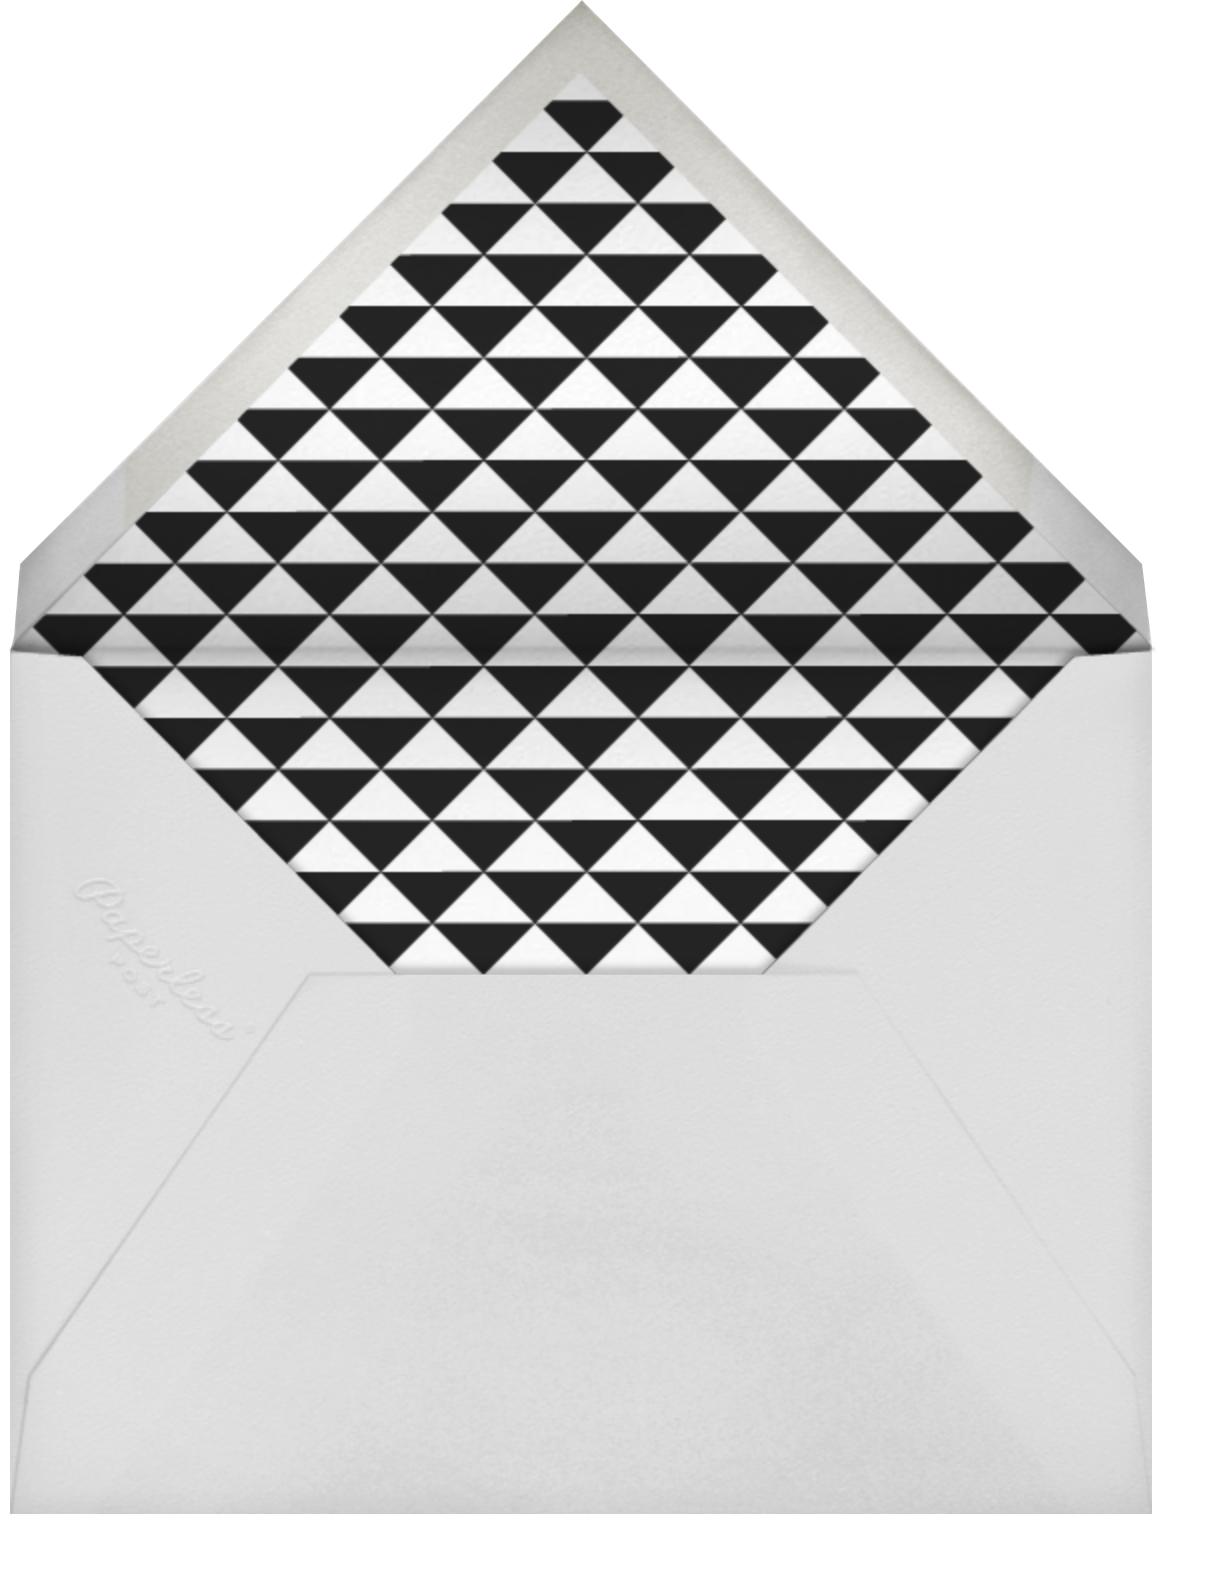 Jolly Good Photo (Her) - Paperless Post - Envelope